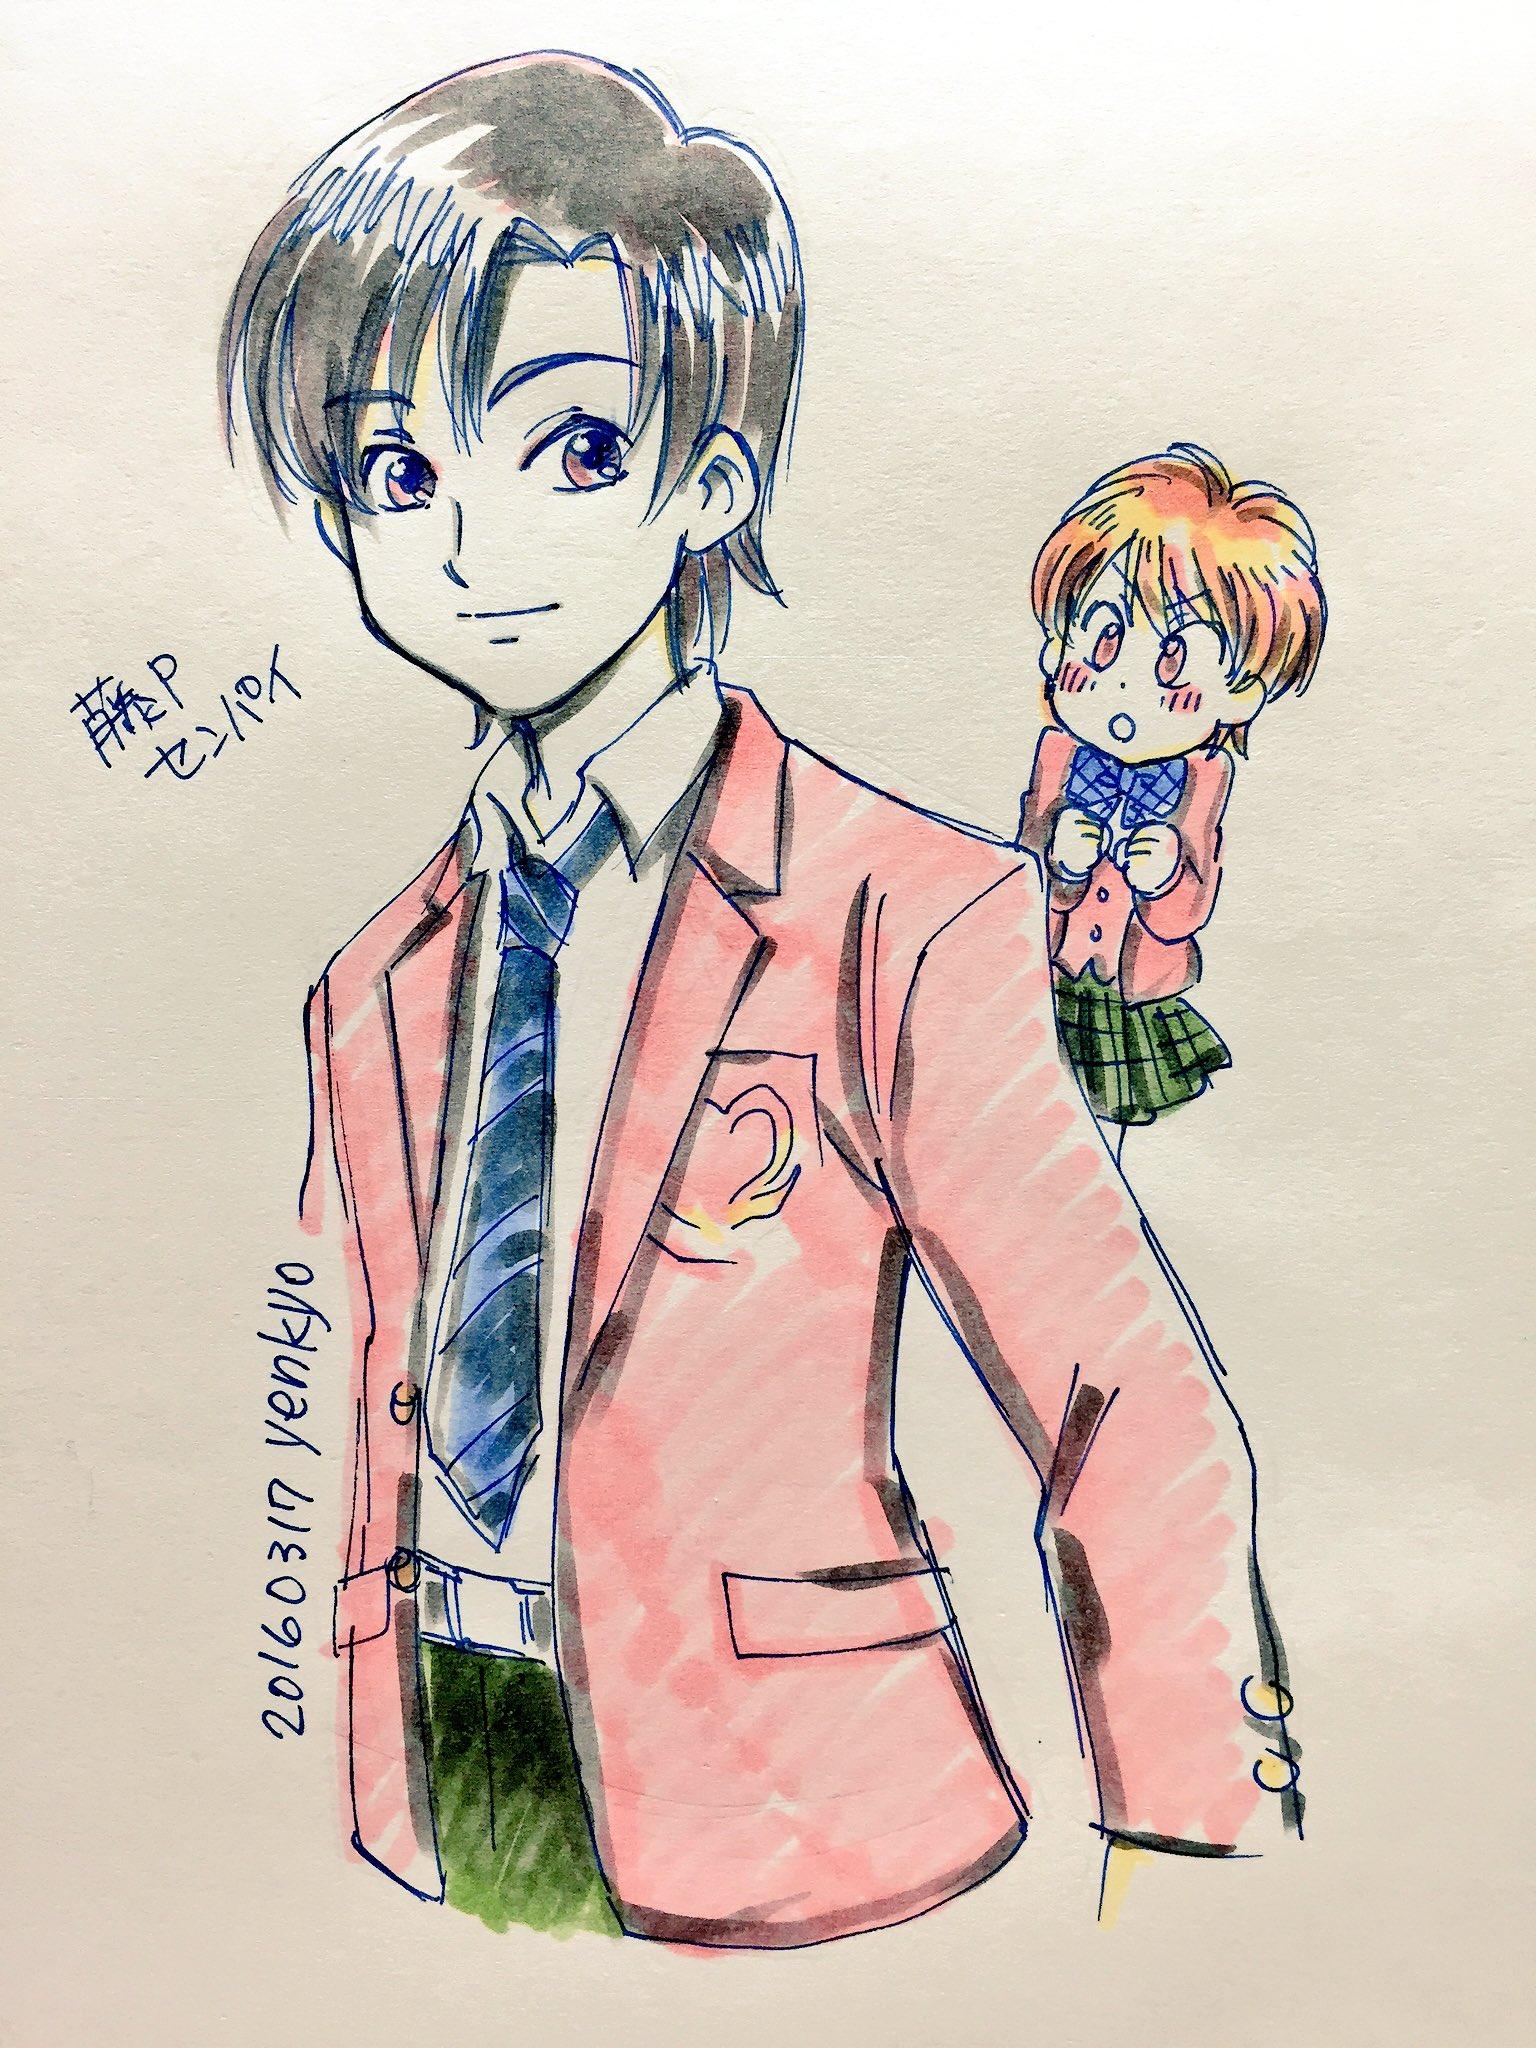 yenkyo@スパコミ3日西K64a (@yenkyo)さんのイラスト